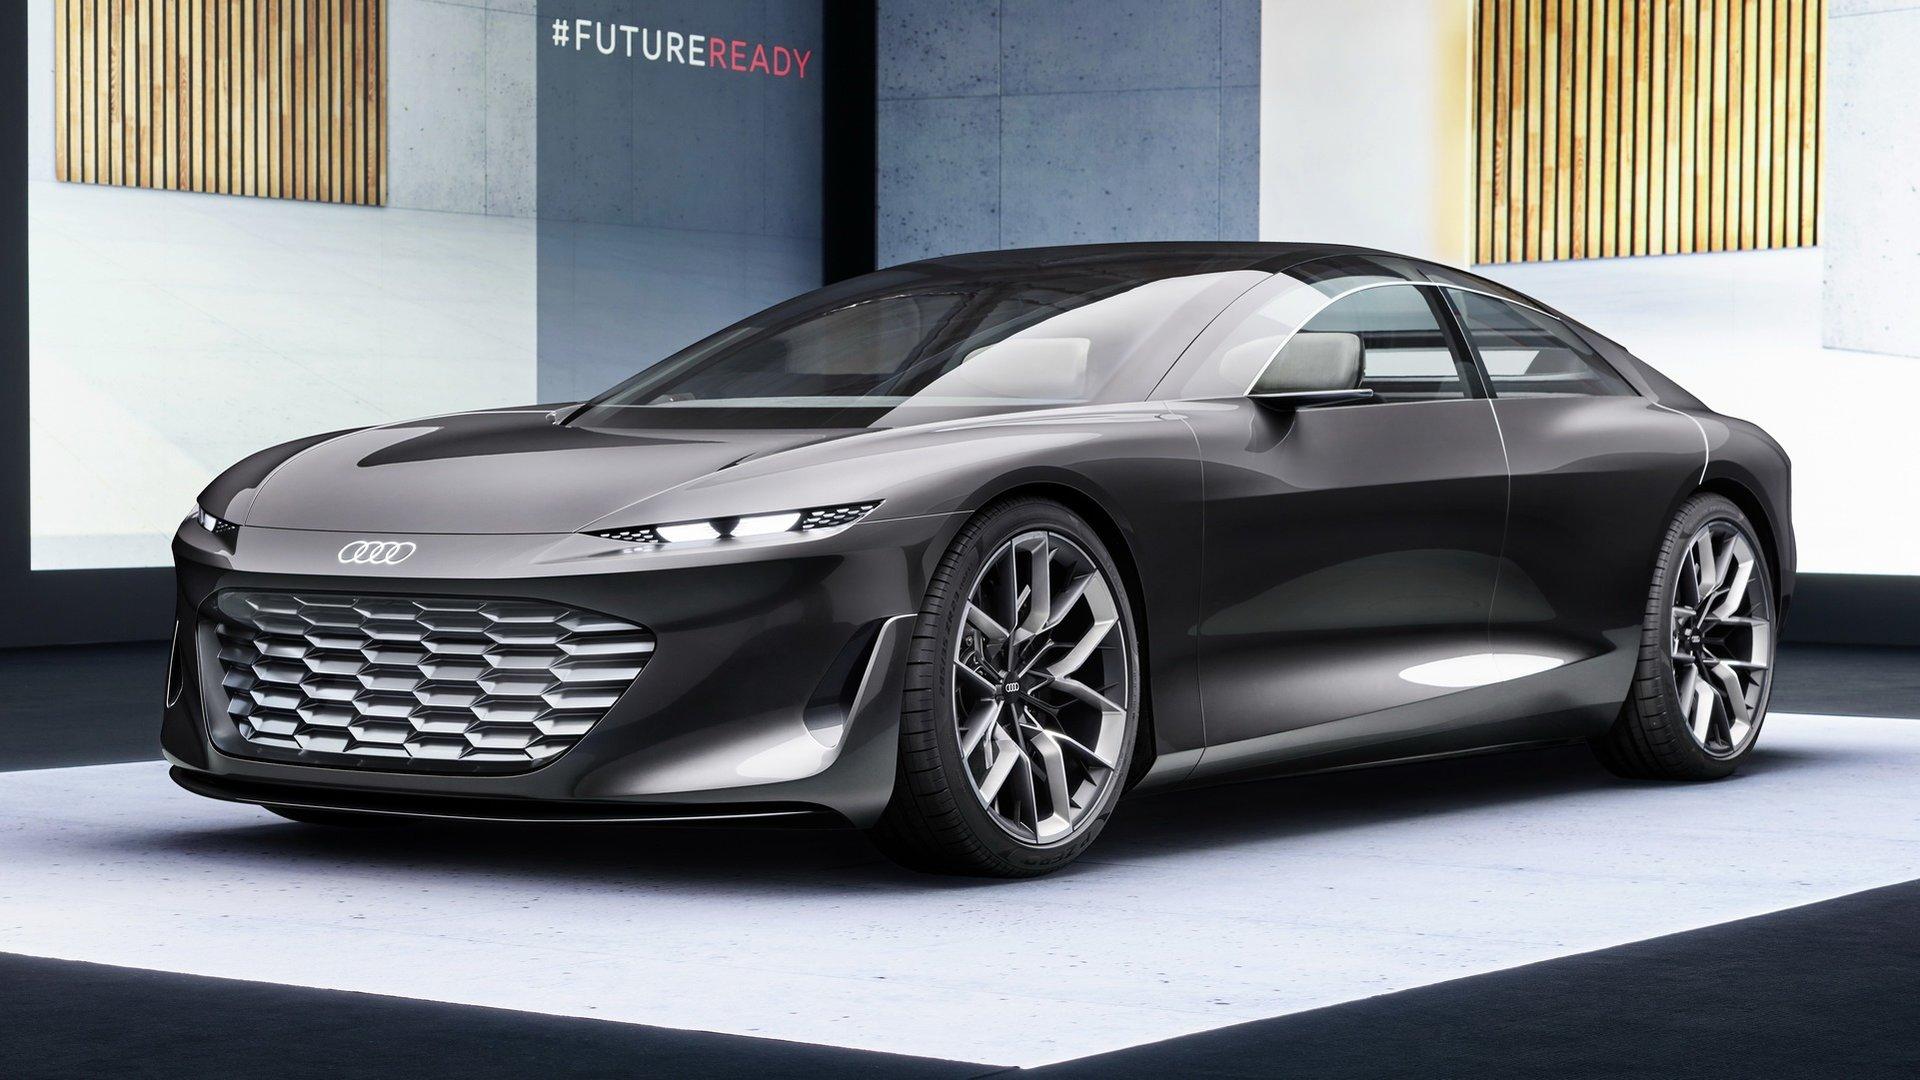 Audi-Grand-Sphere-Concept-17477.jpg